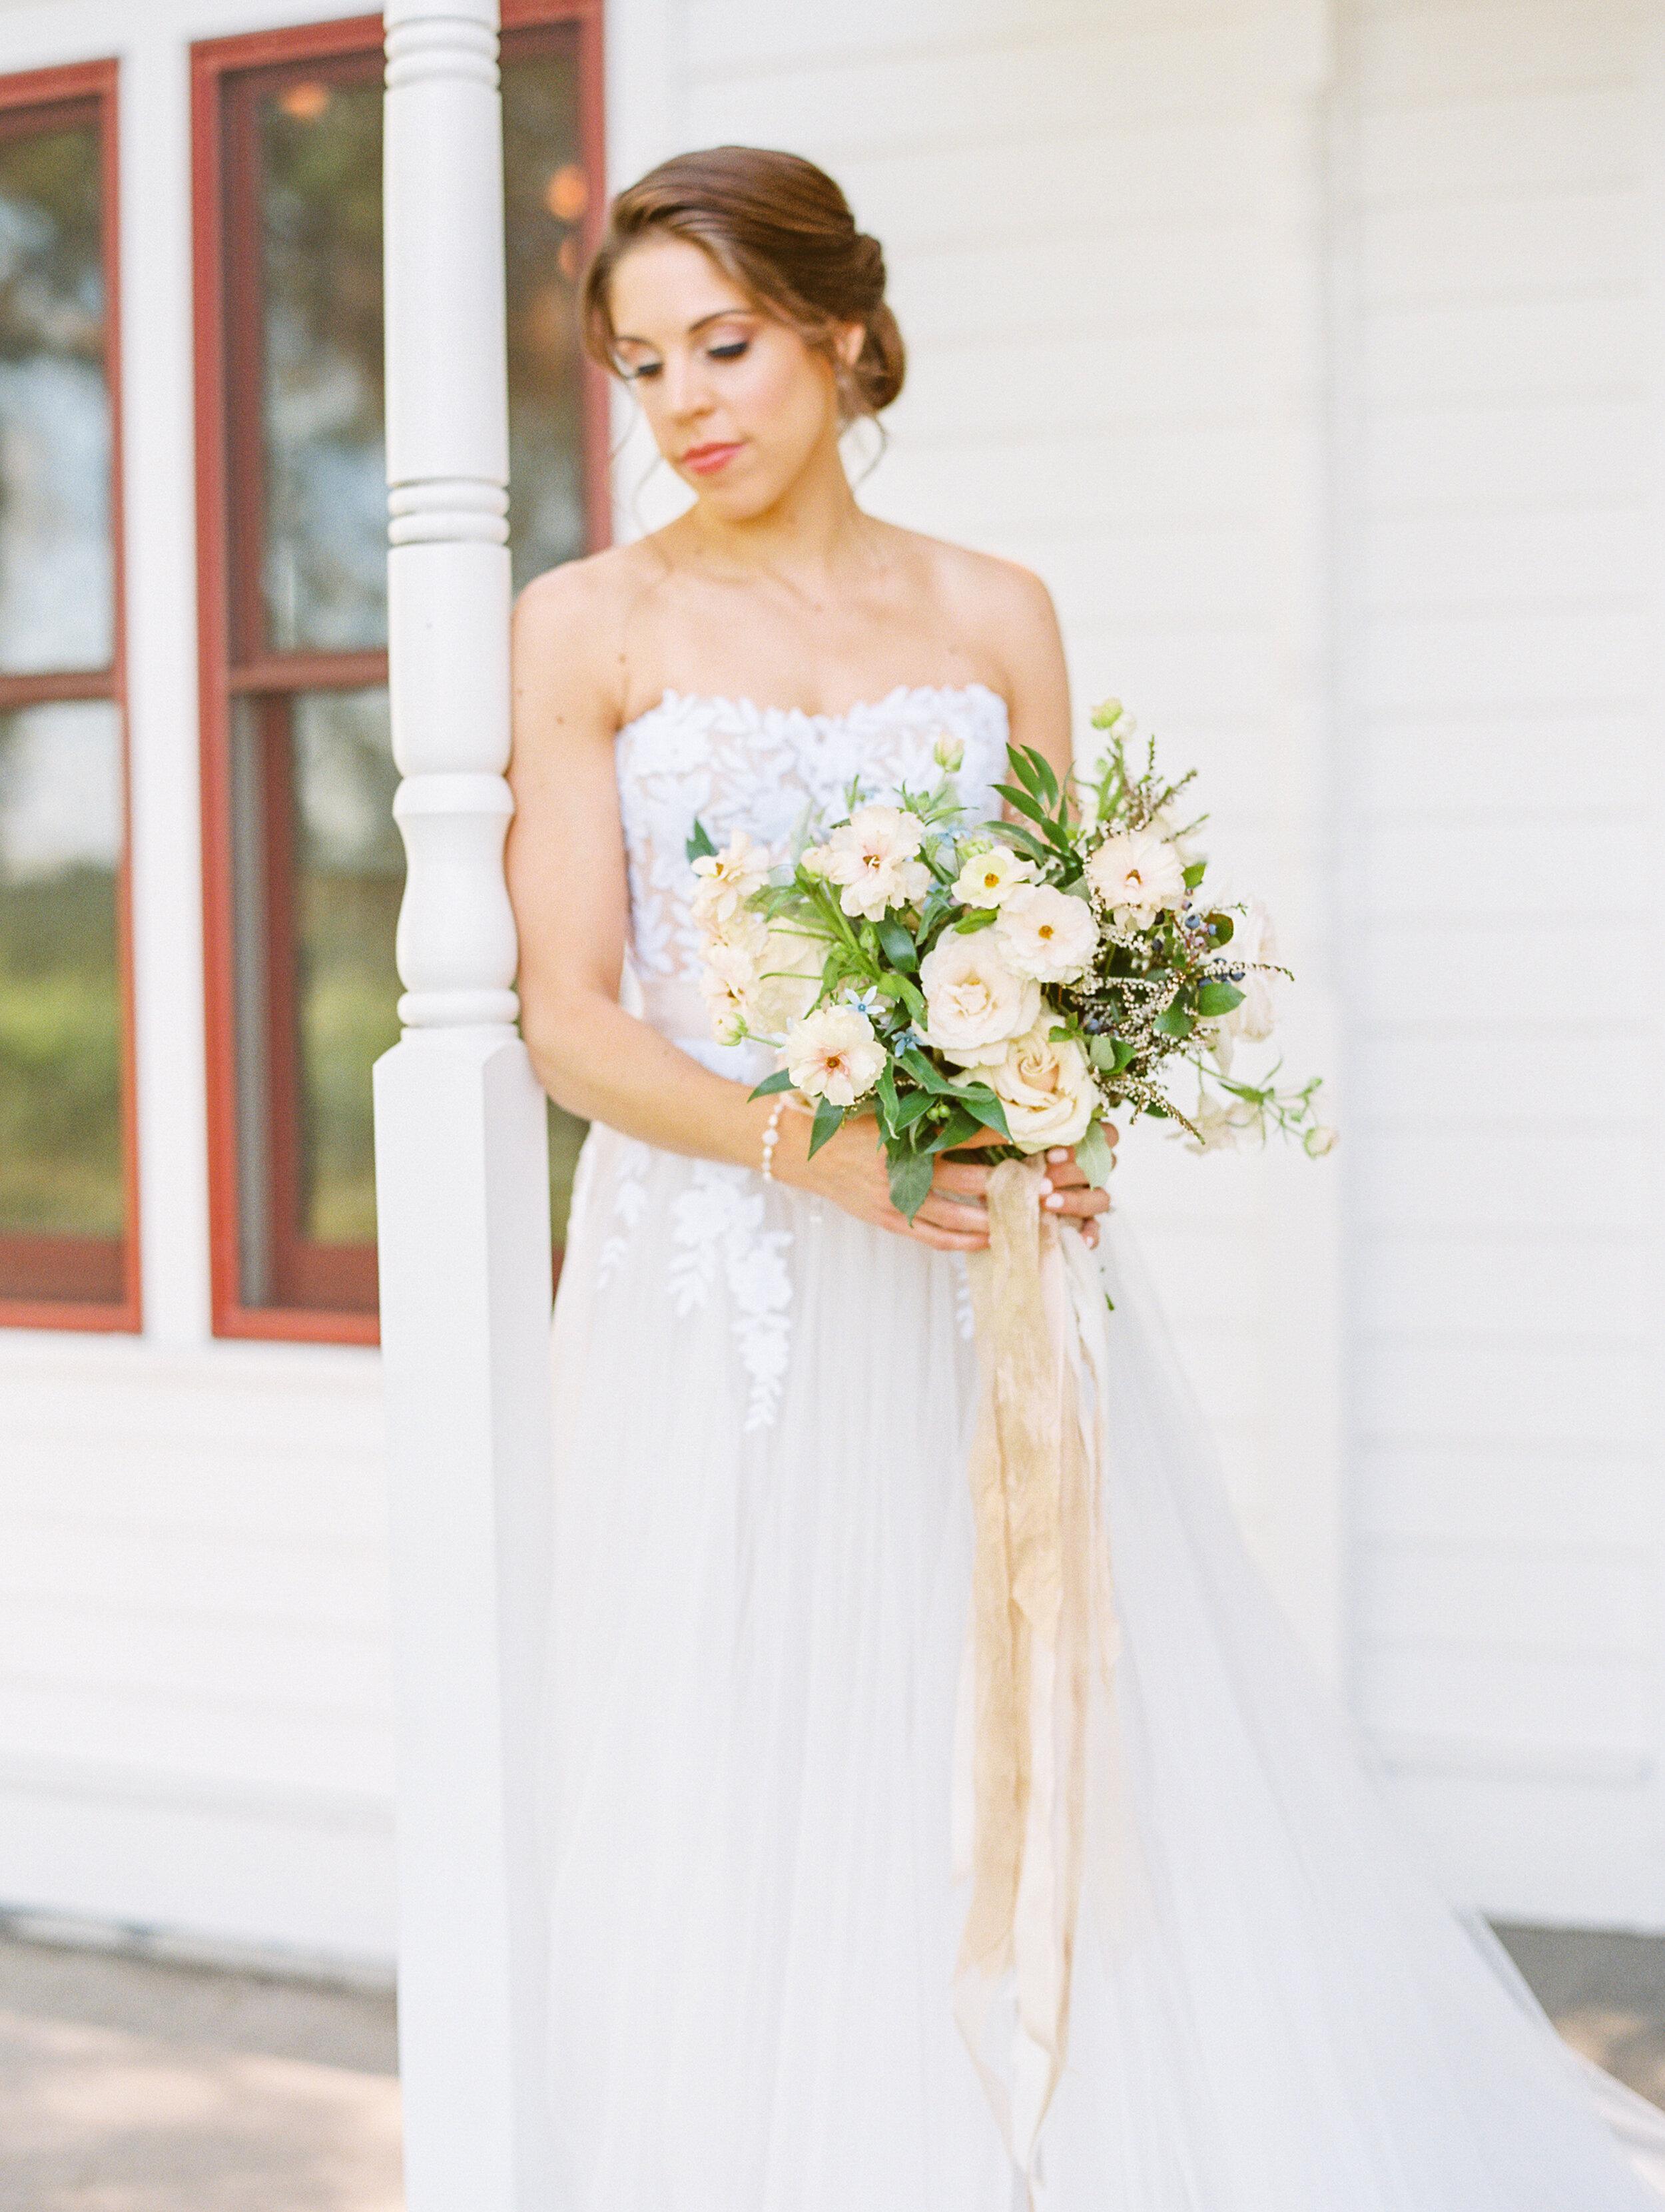 Steinlage+Wedding+Getting+Ready-88.jpg